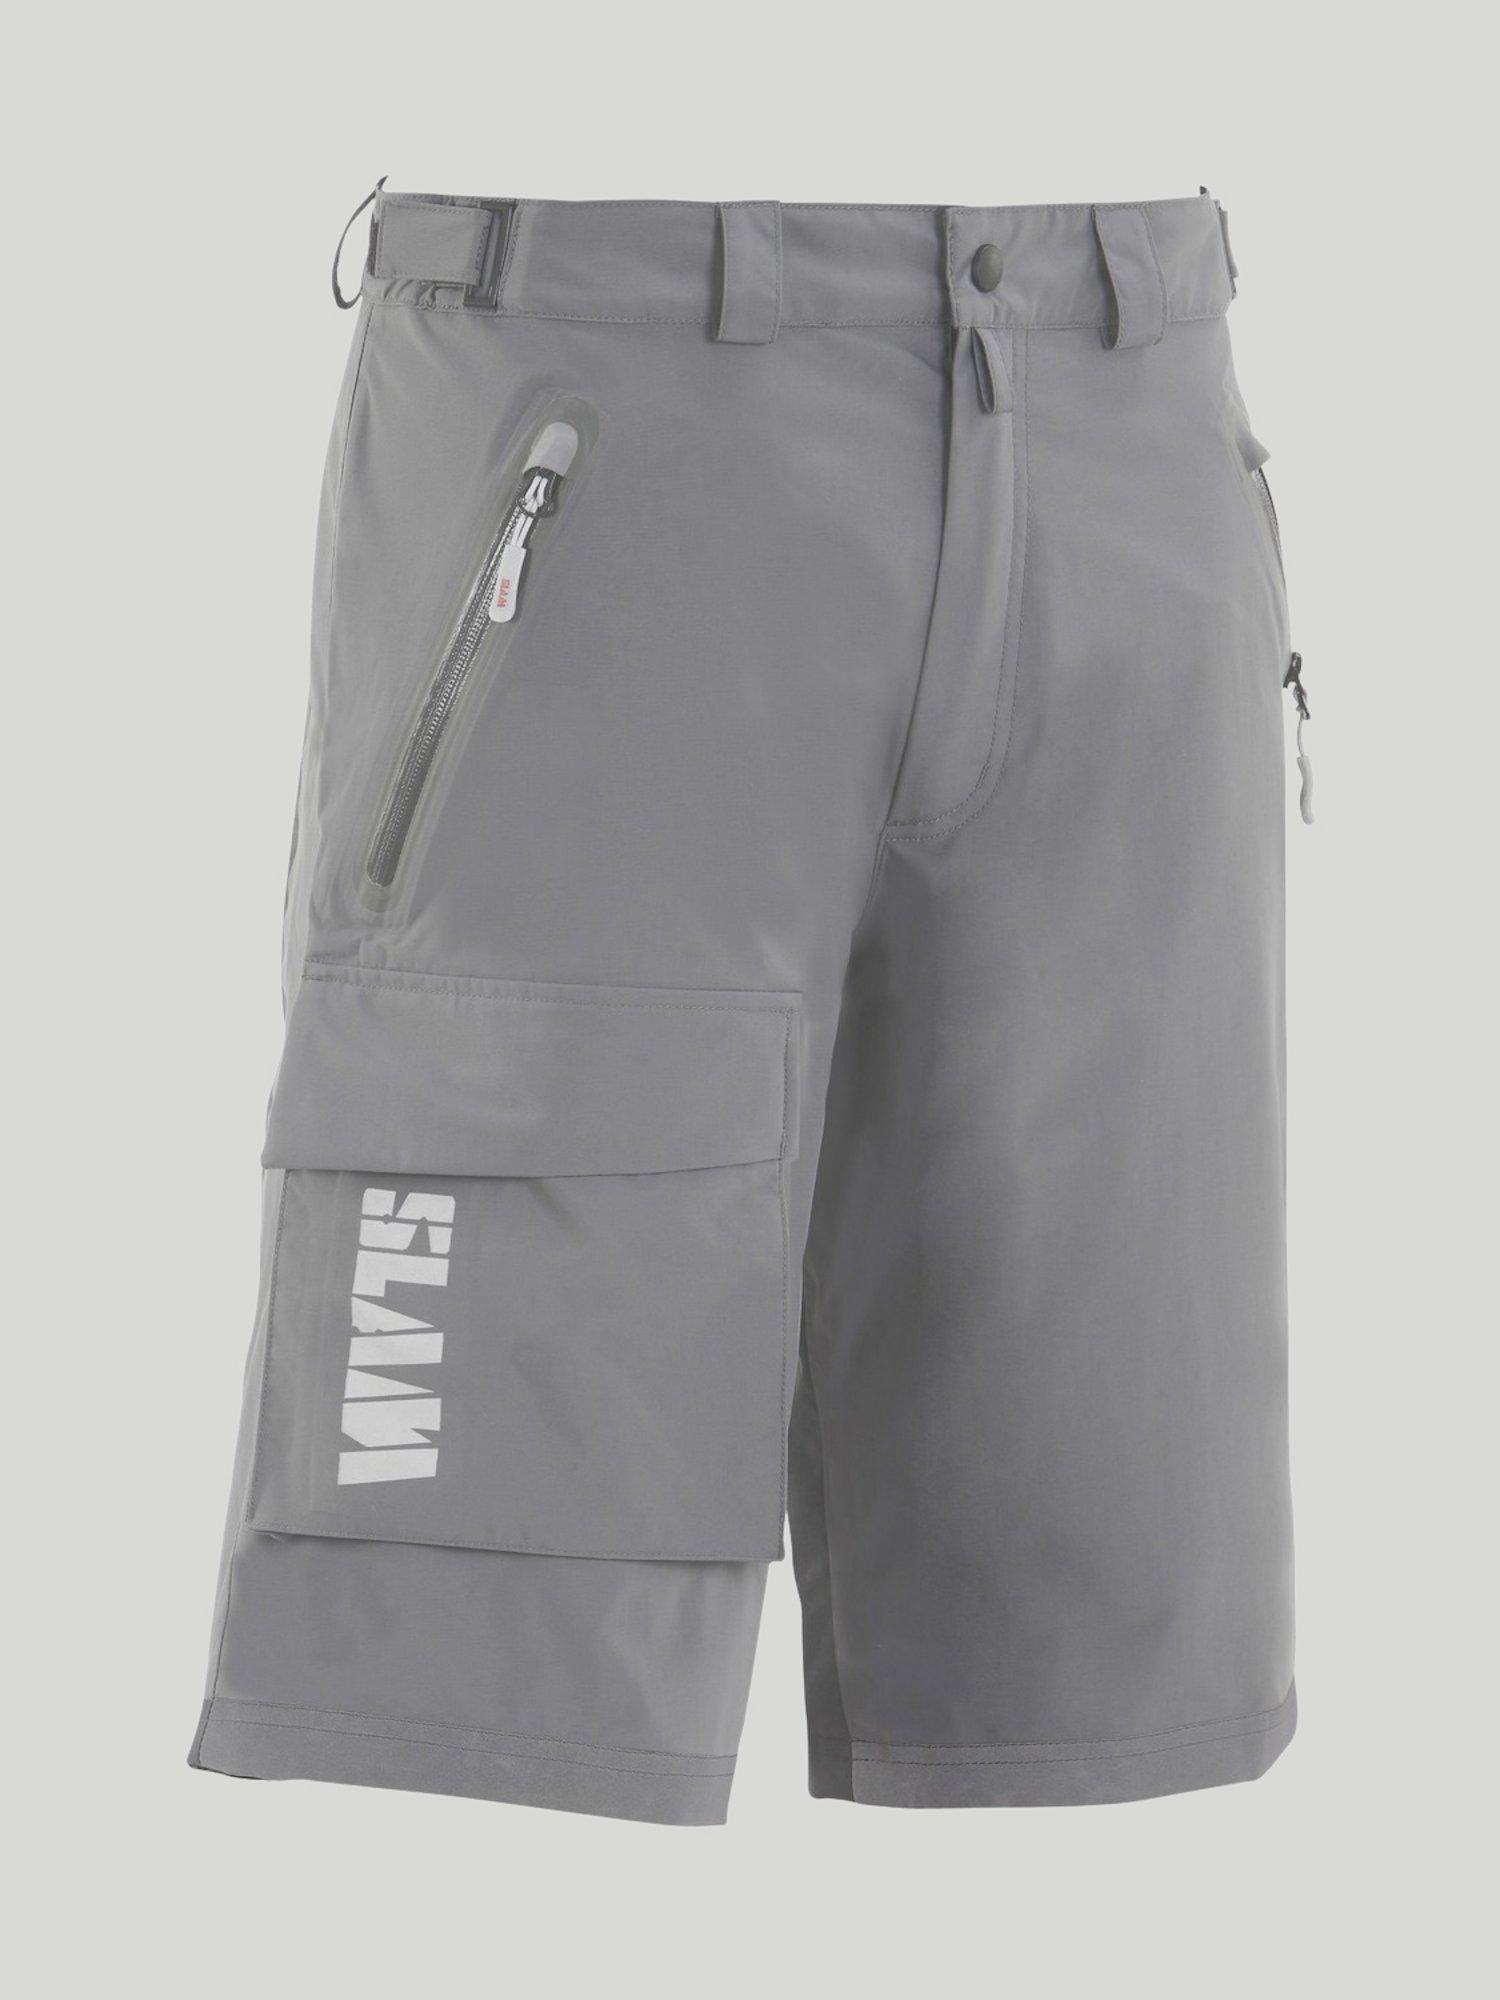 Force 2 shorts - Grey